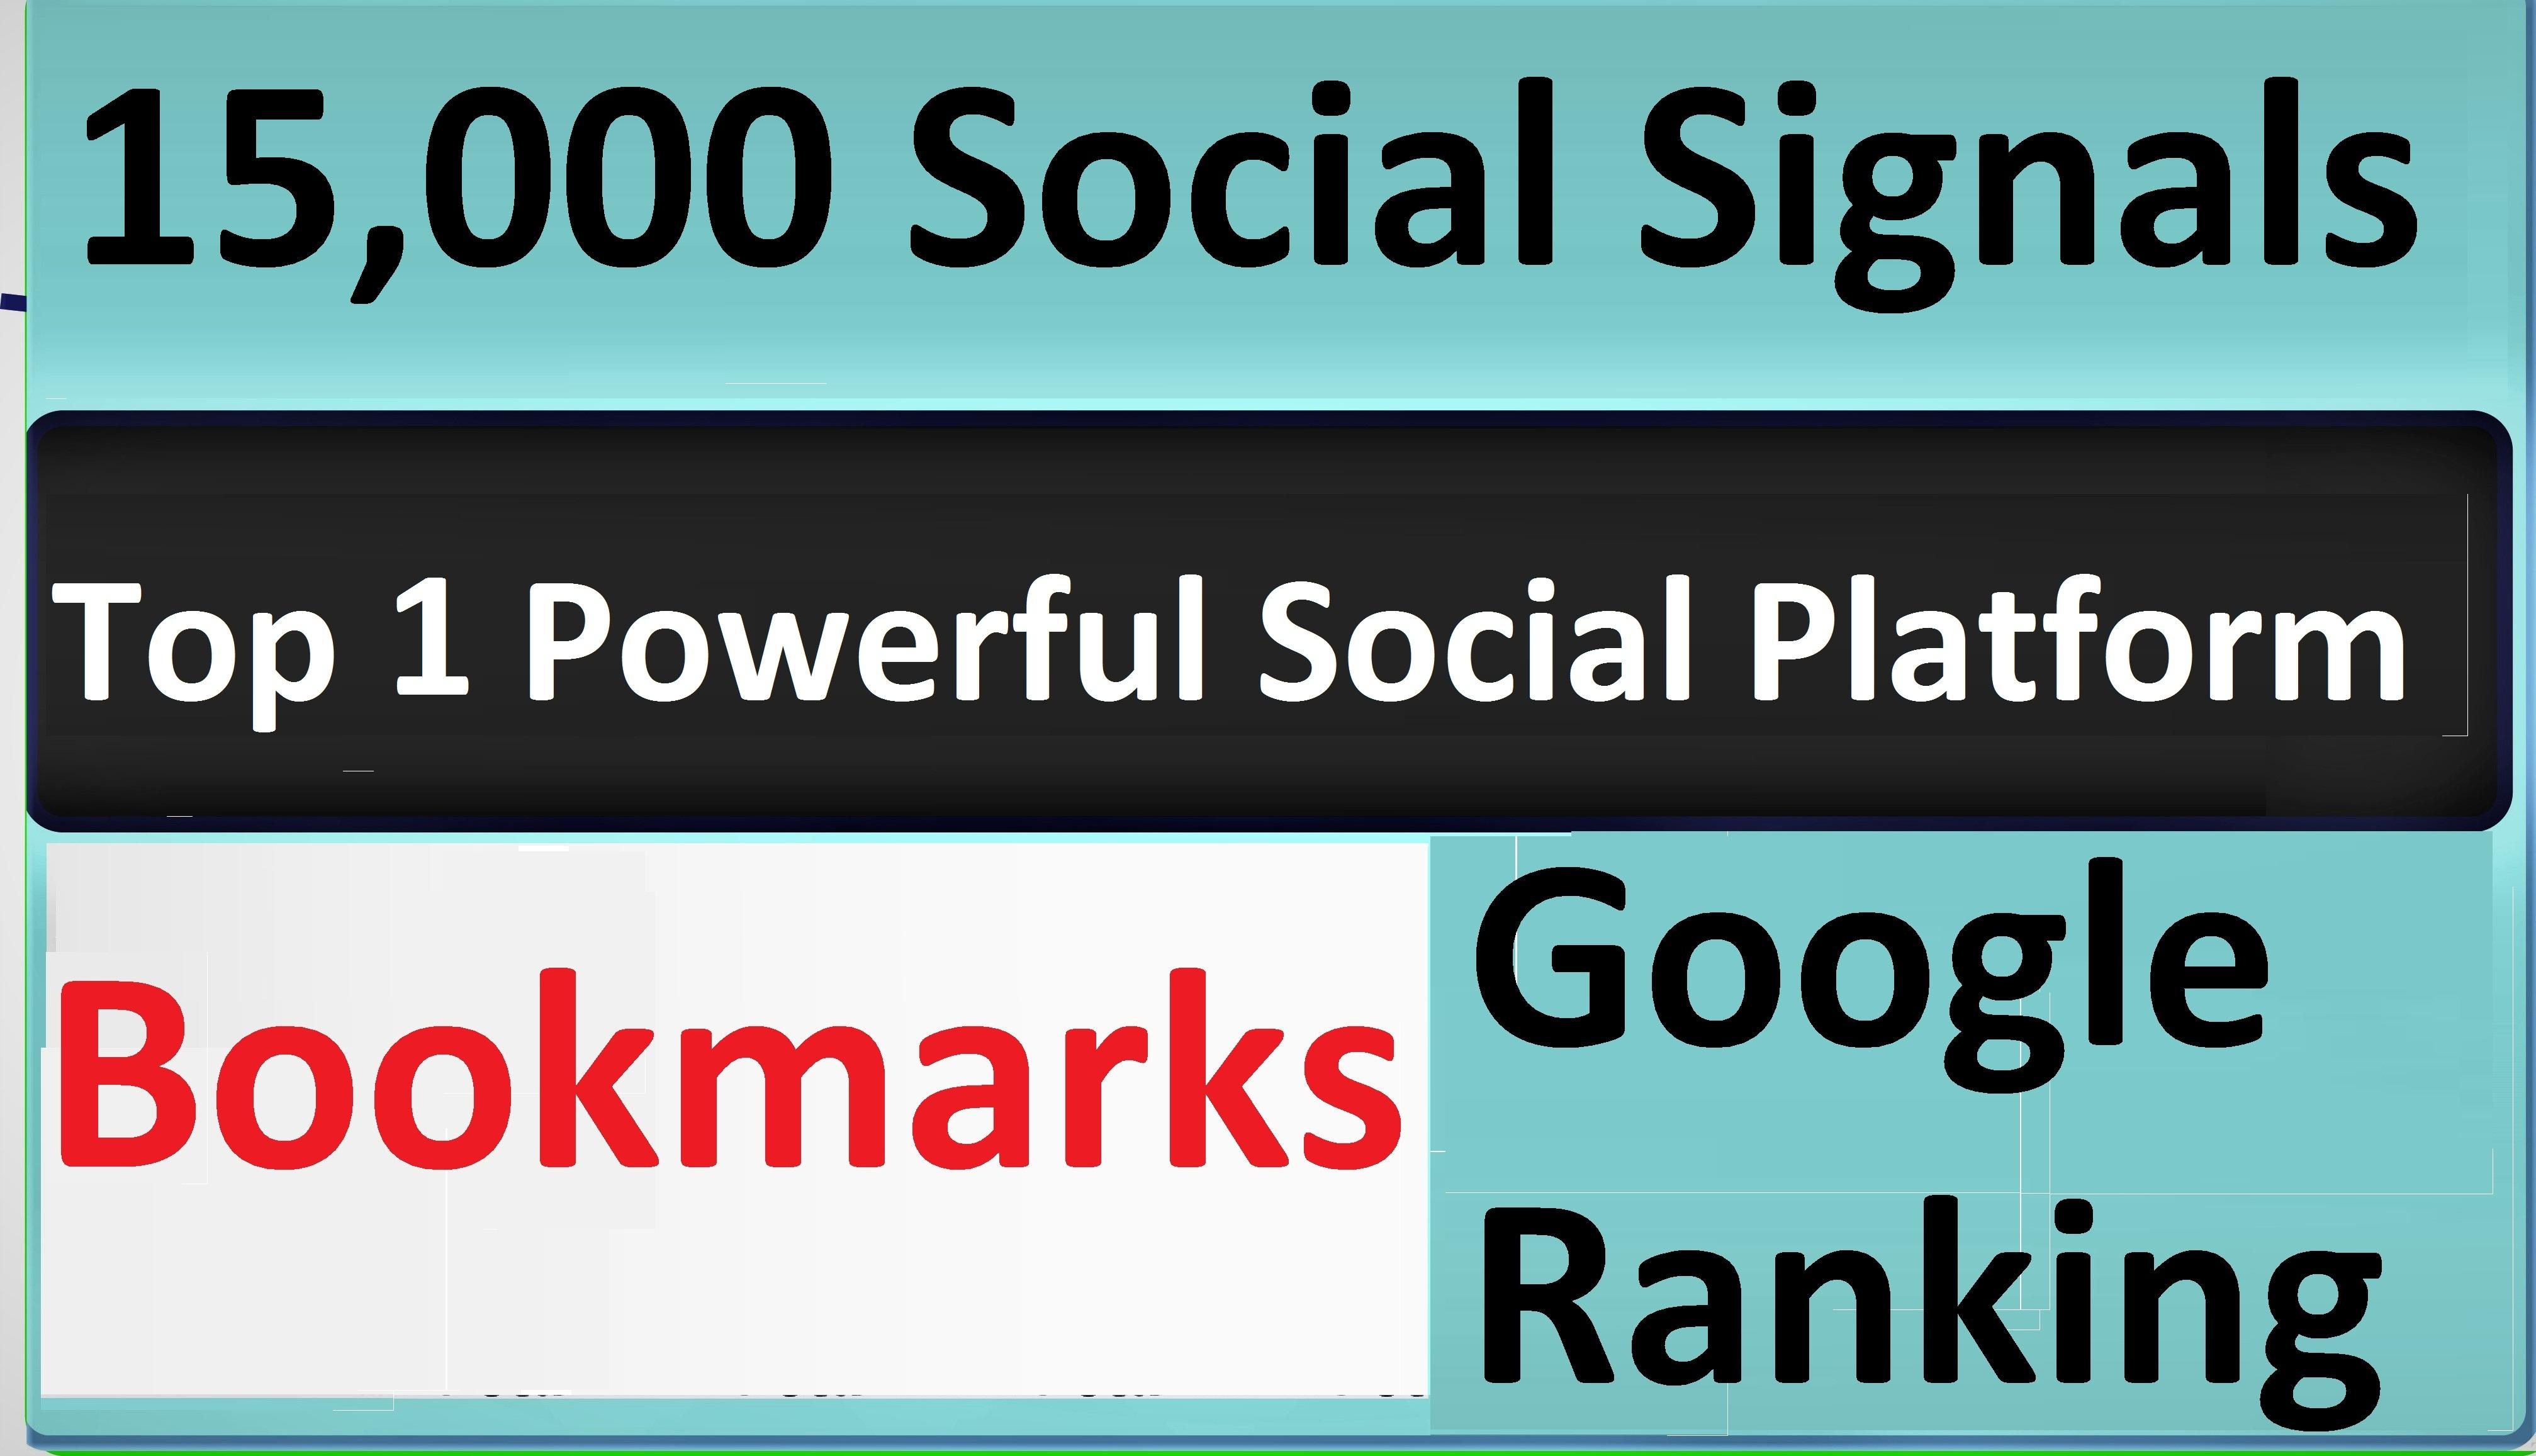 Give Top 1 Powerful Social Platform 15,000 PR9 SEO Social Signals Share Bookmarks Important Google